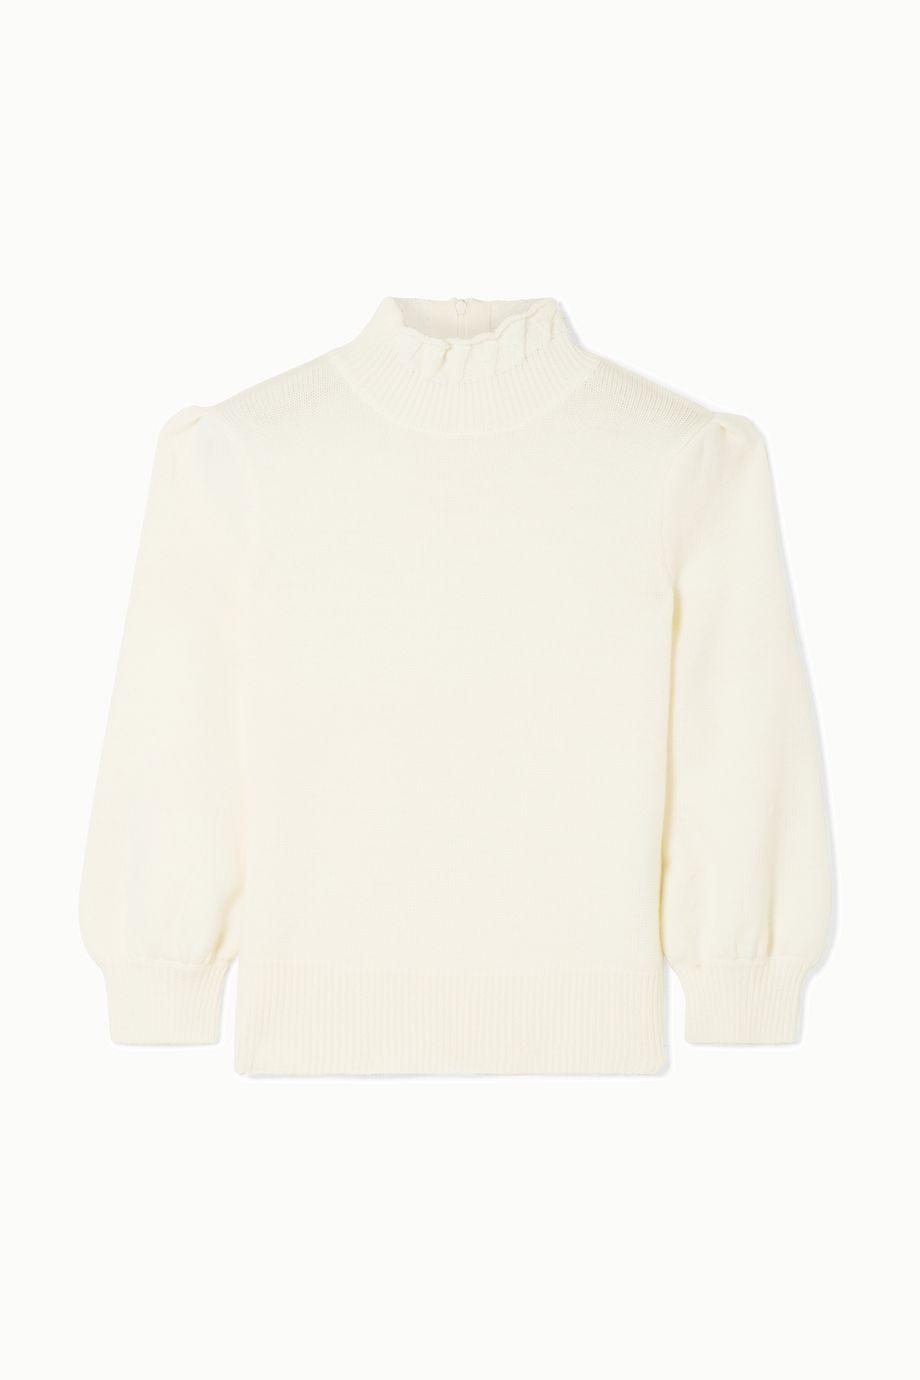 Co Ruffled merino wool turtleneck sweater